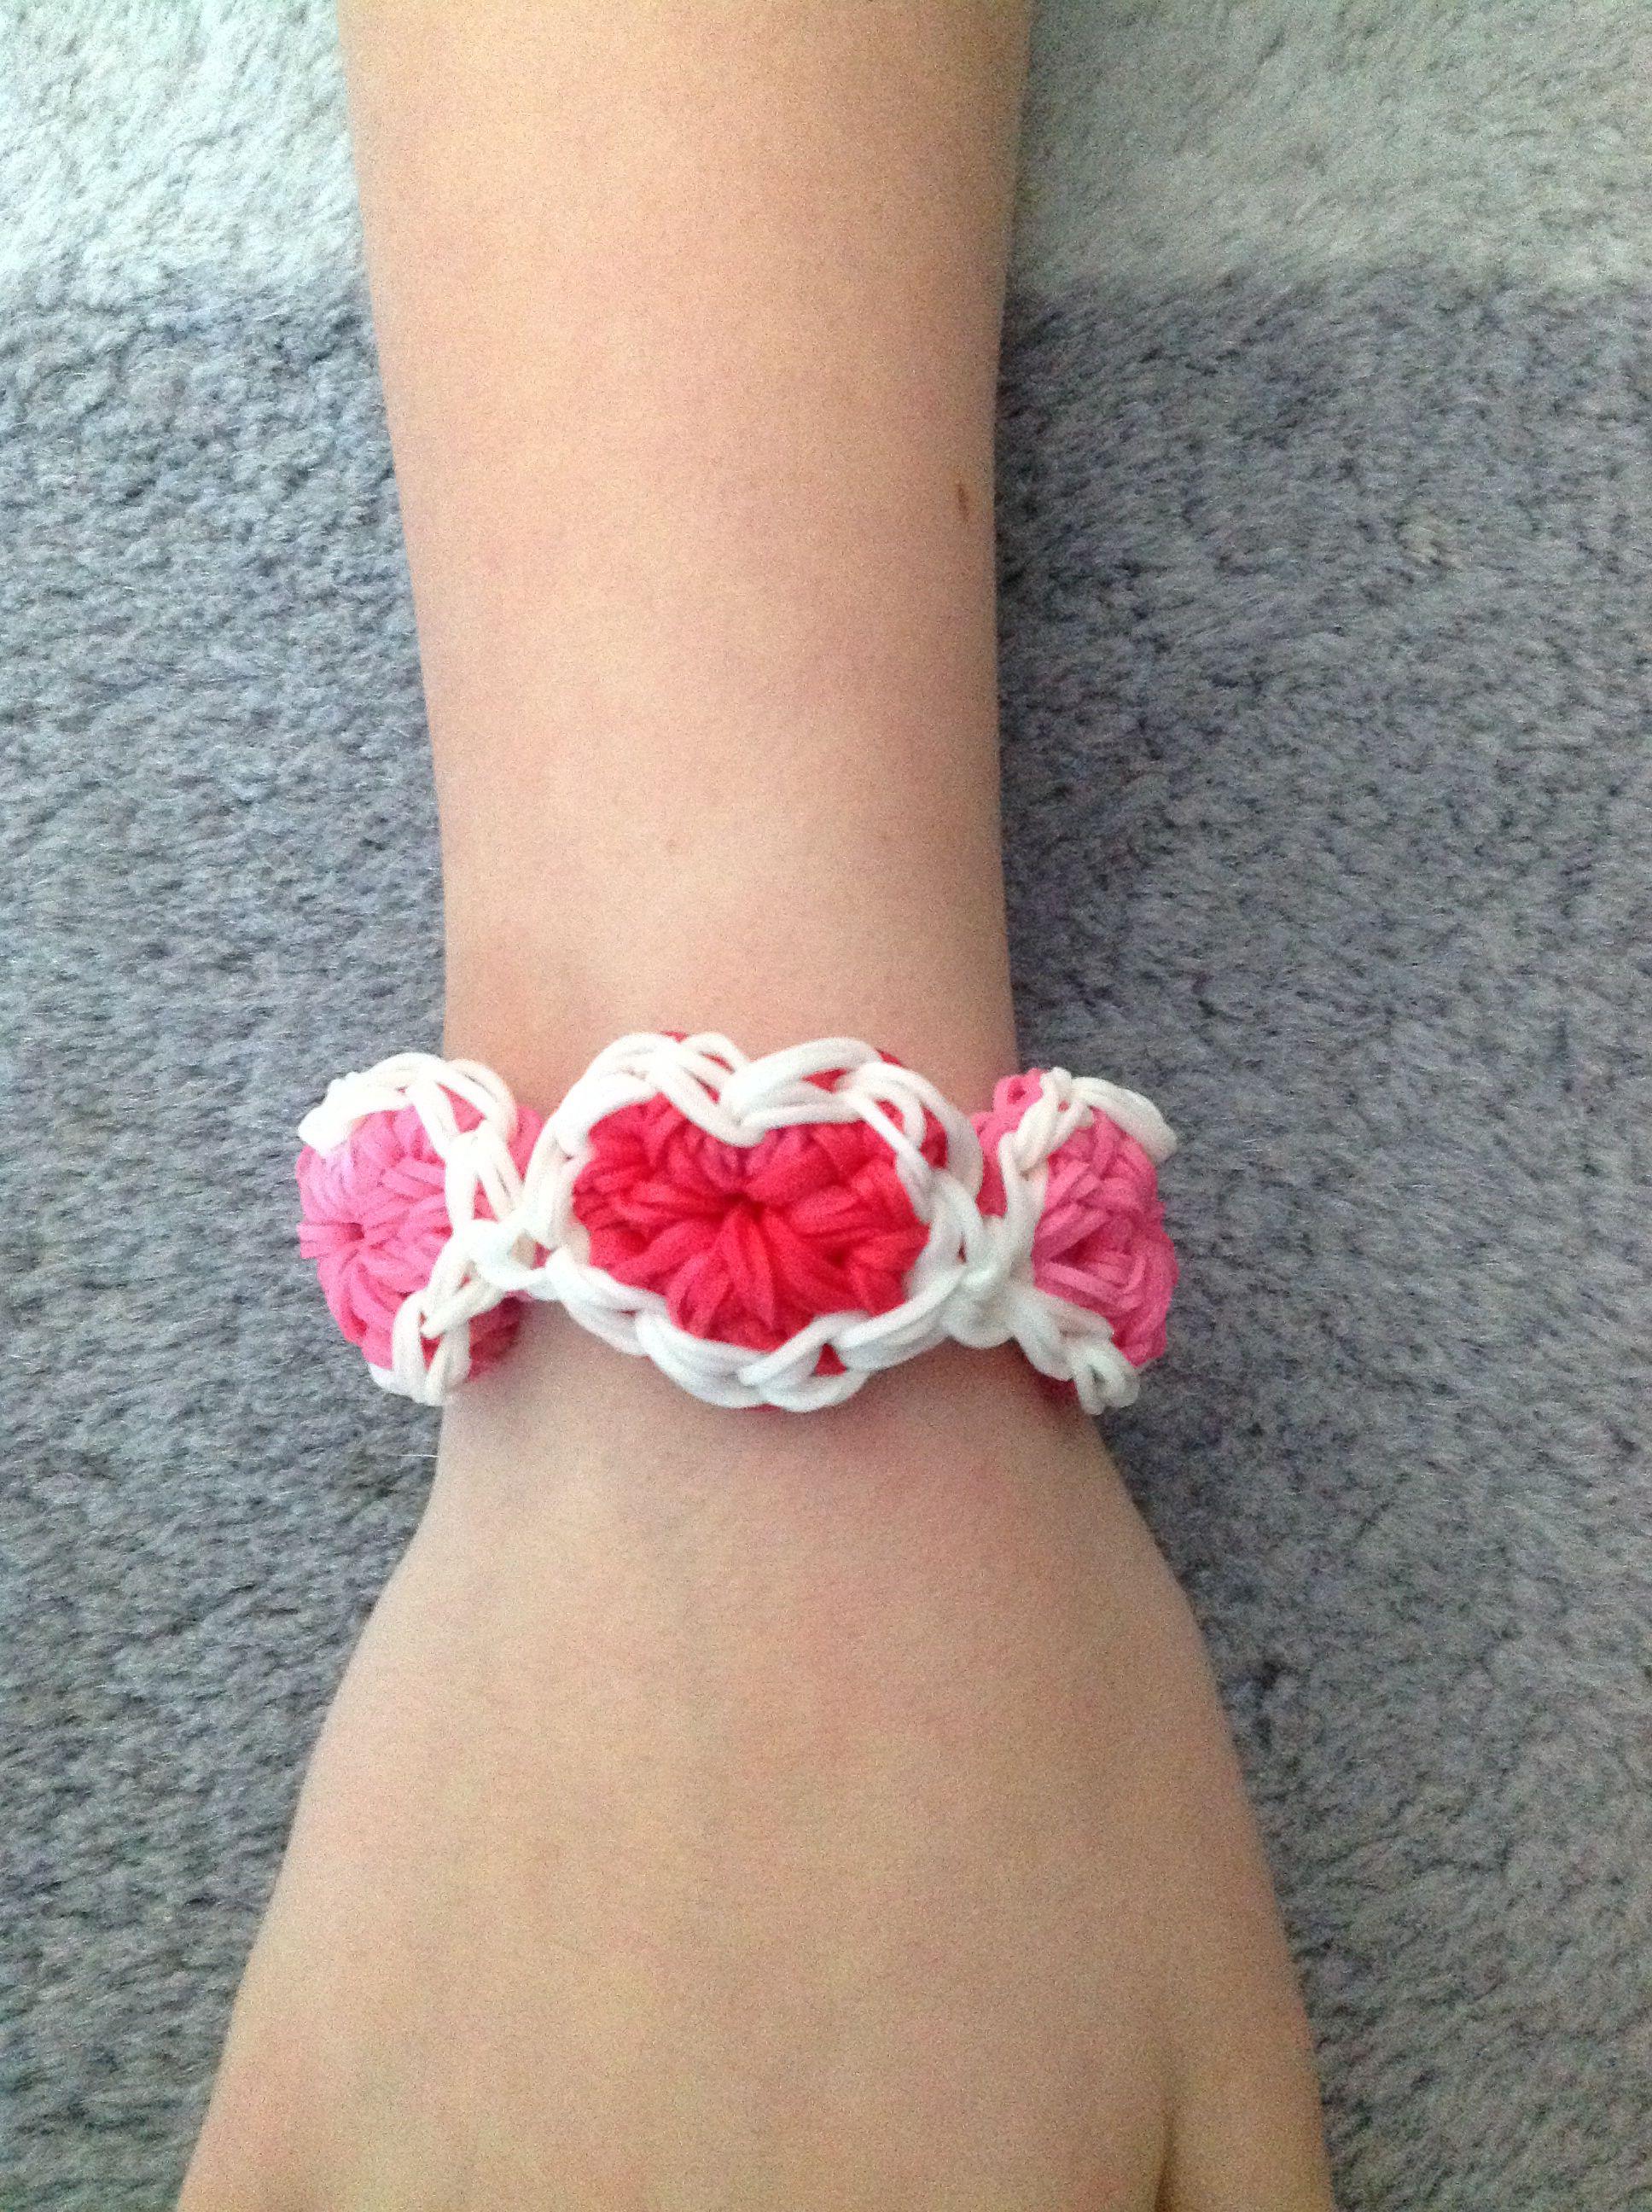 Valentine Bracelets Justin Toys : Diamond ridge bracelet heart patterns toy and rainbow loom